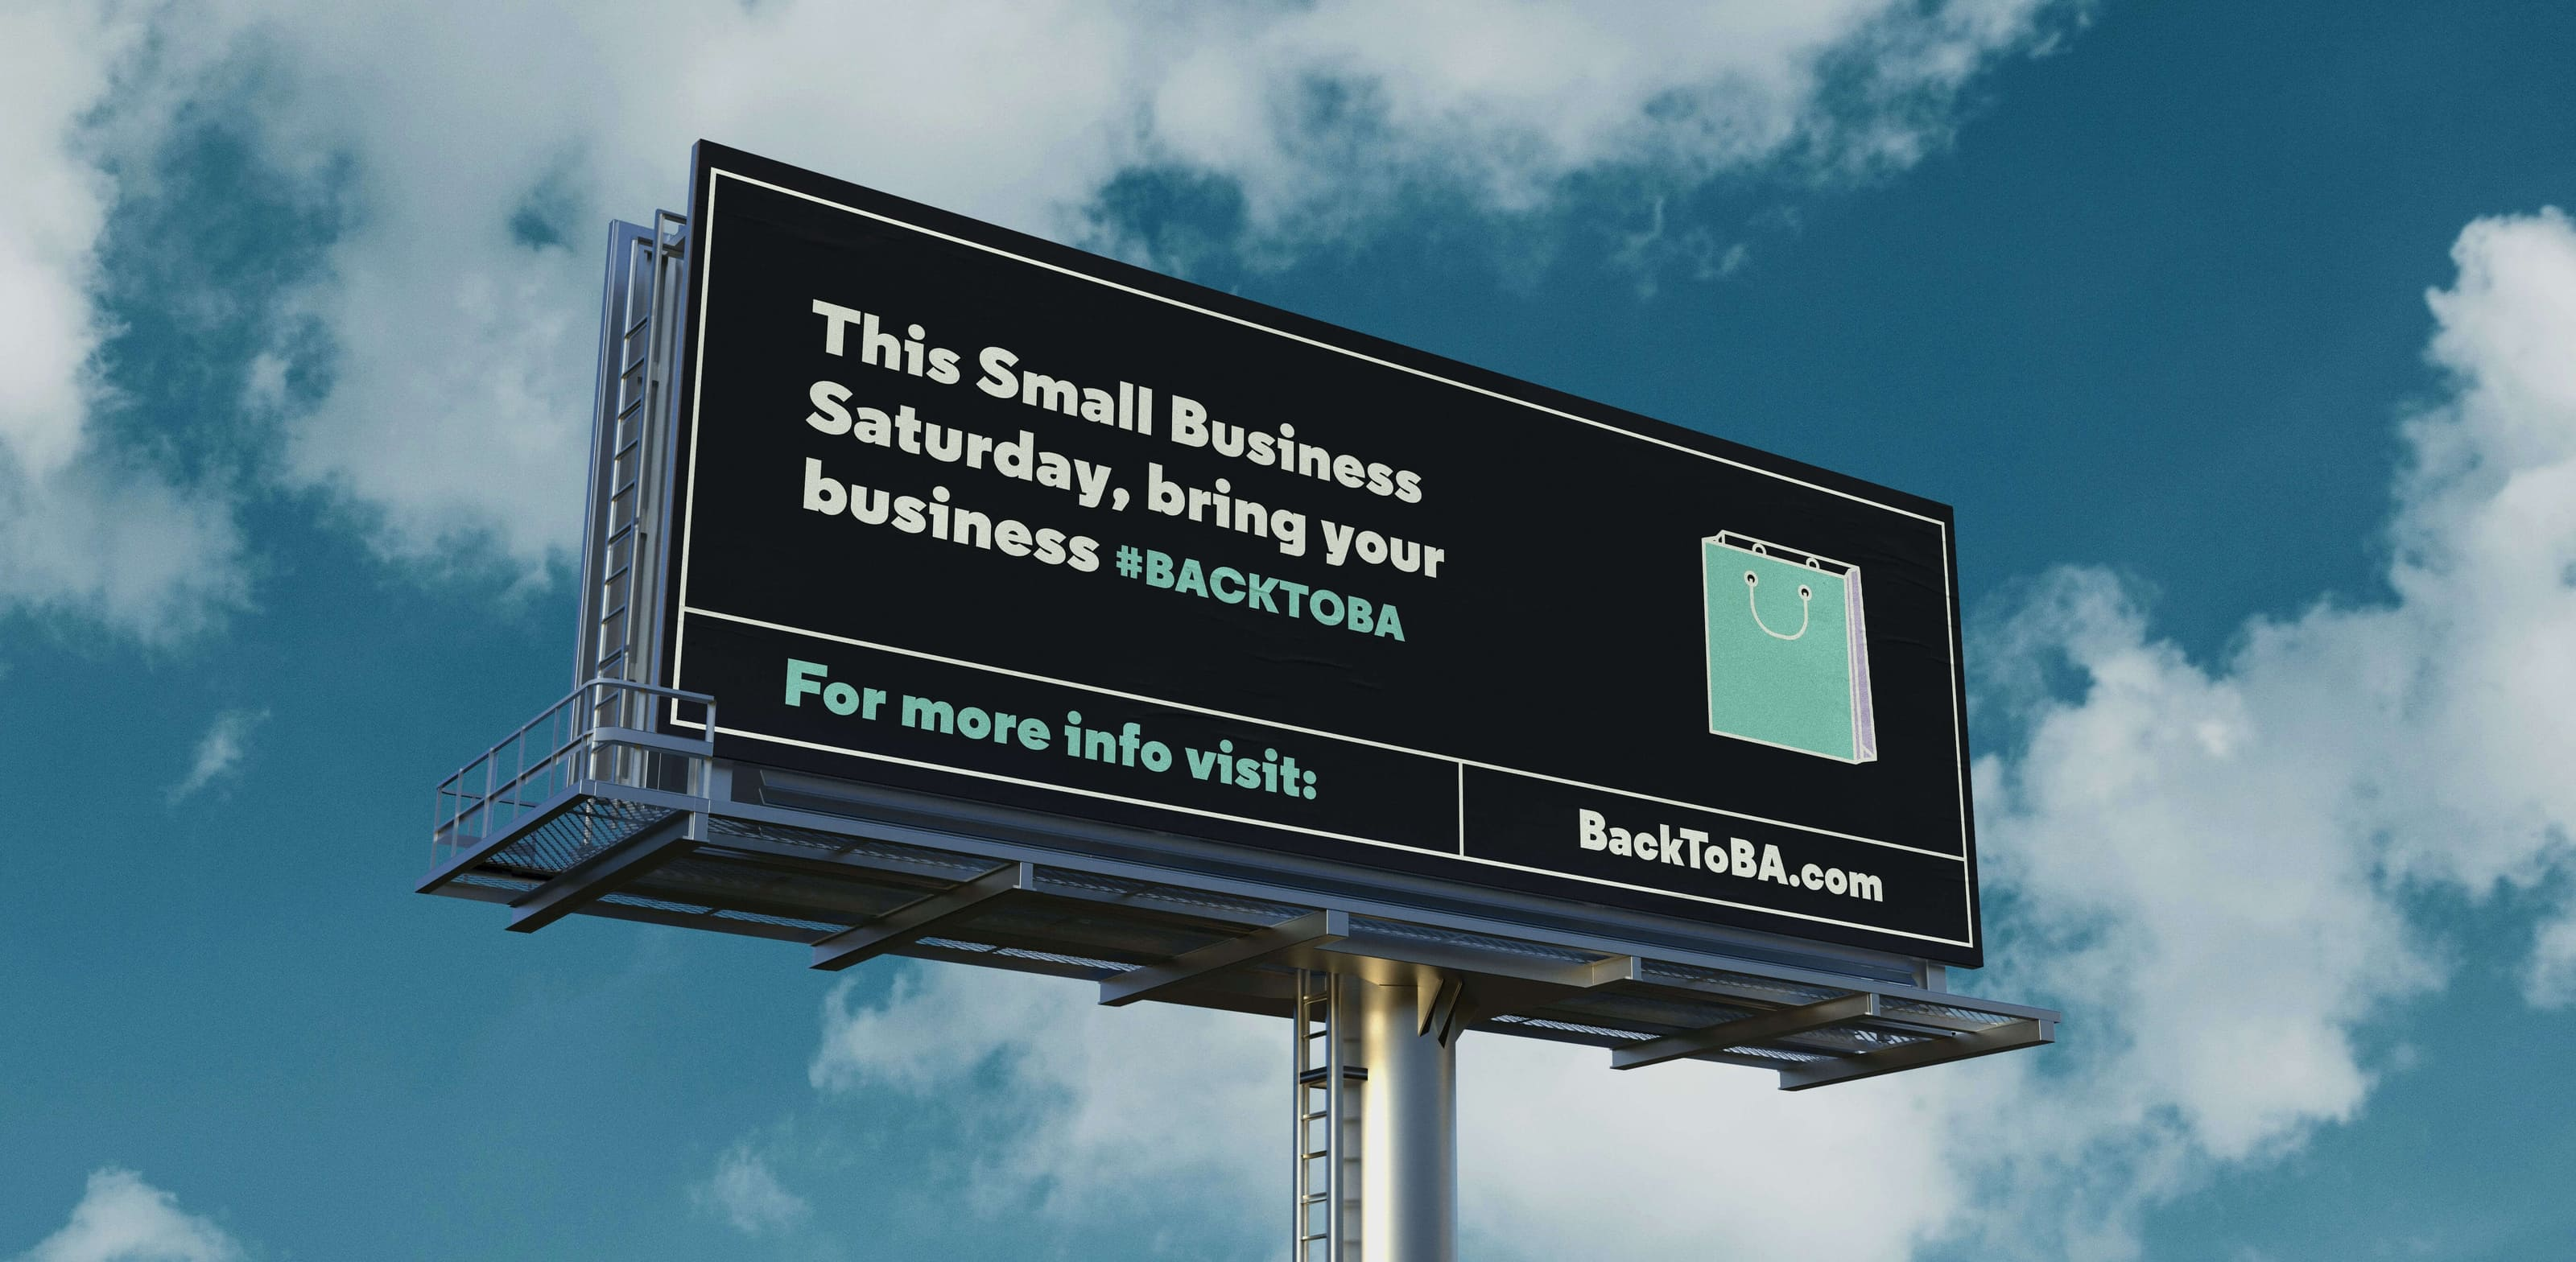 Back to B.A. billboard outdoor media